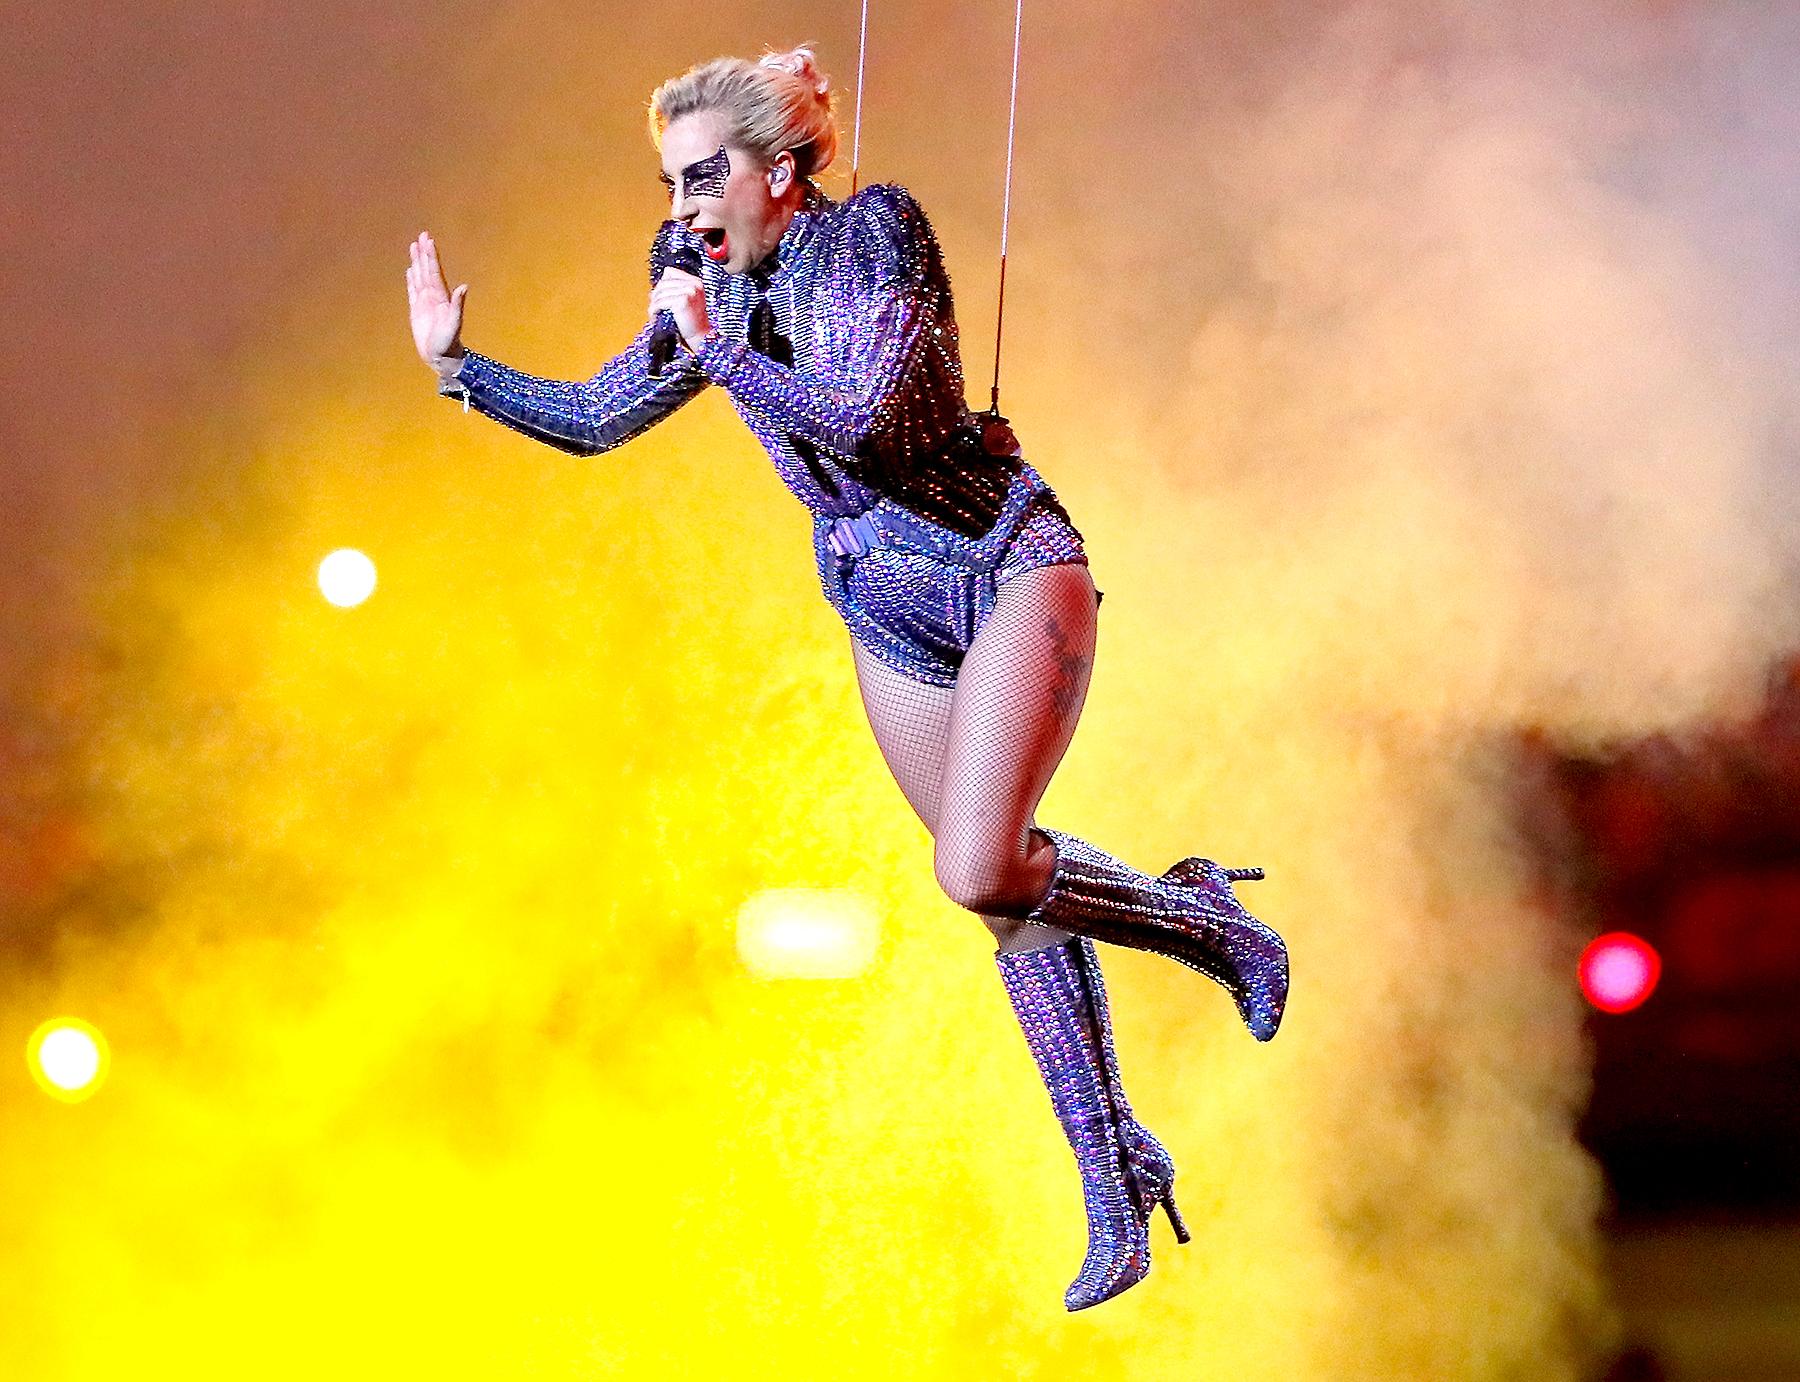 Lady Gaga performs during the Pepsi Zero Sugar Super Bowl LI Halftime Show at NRG Stadium on Feb. 5, 2017, in Houston.